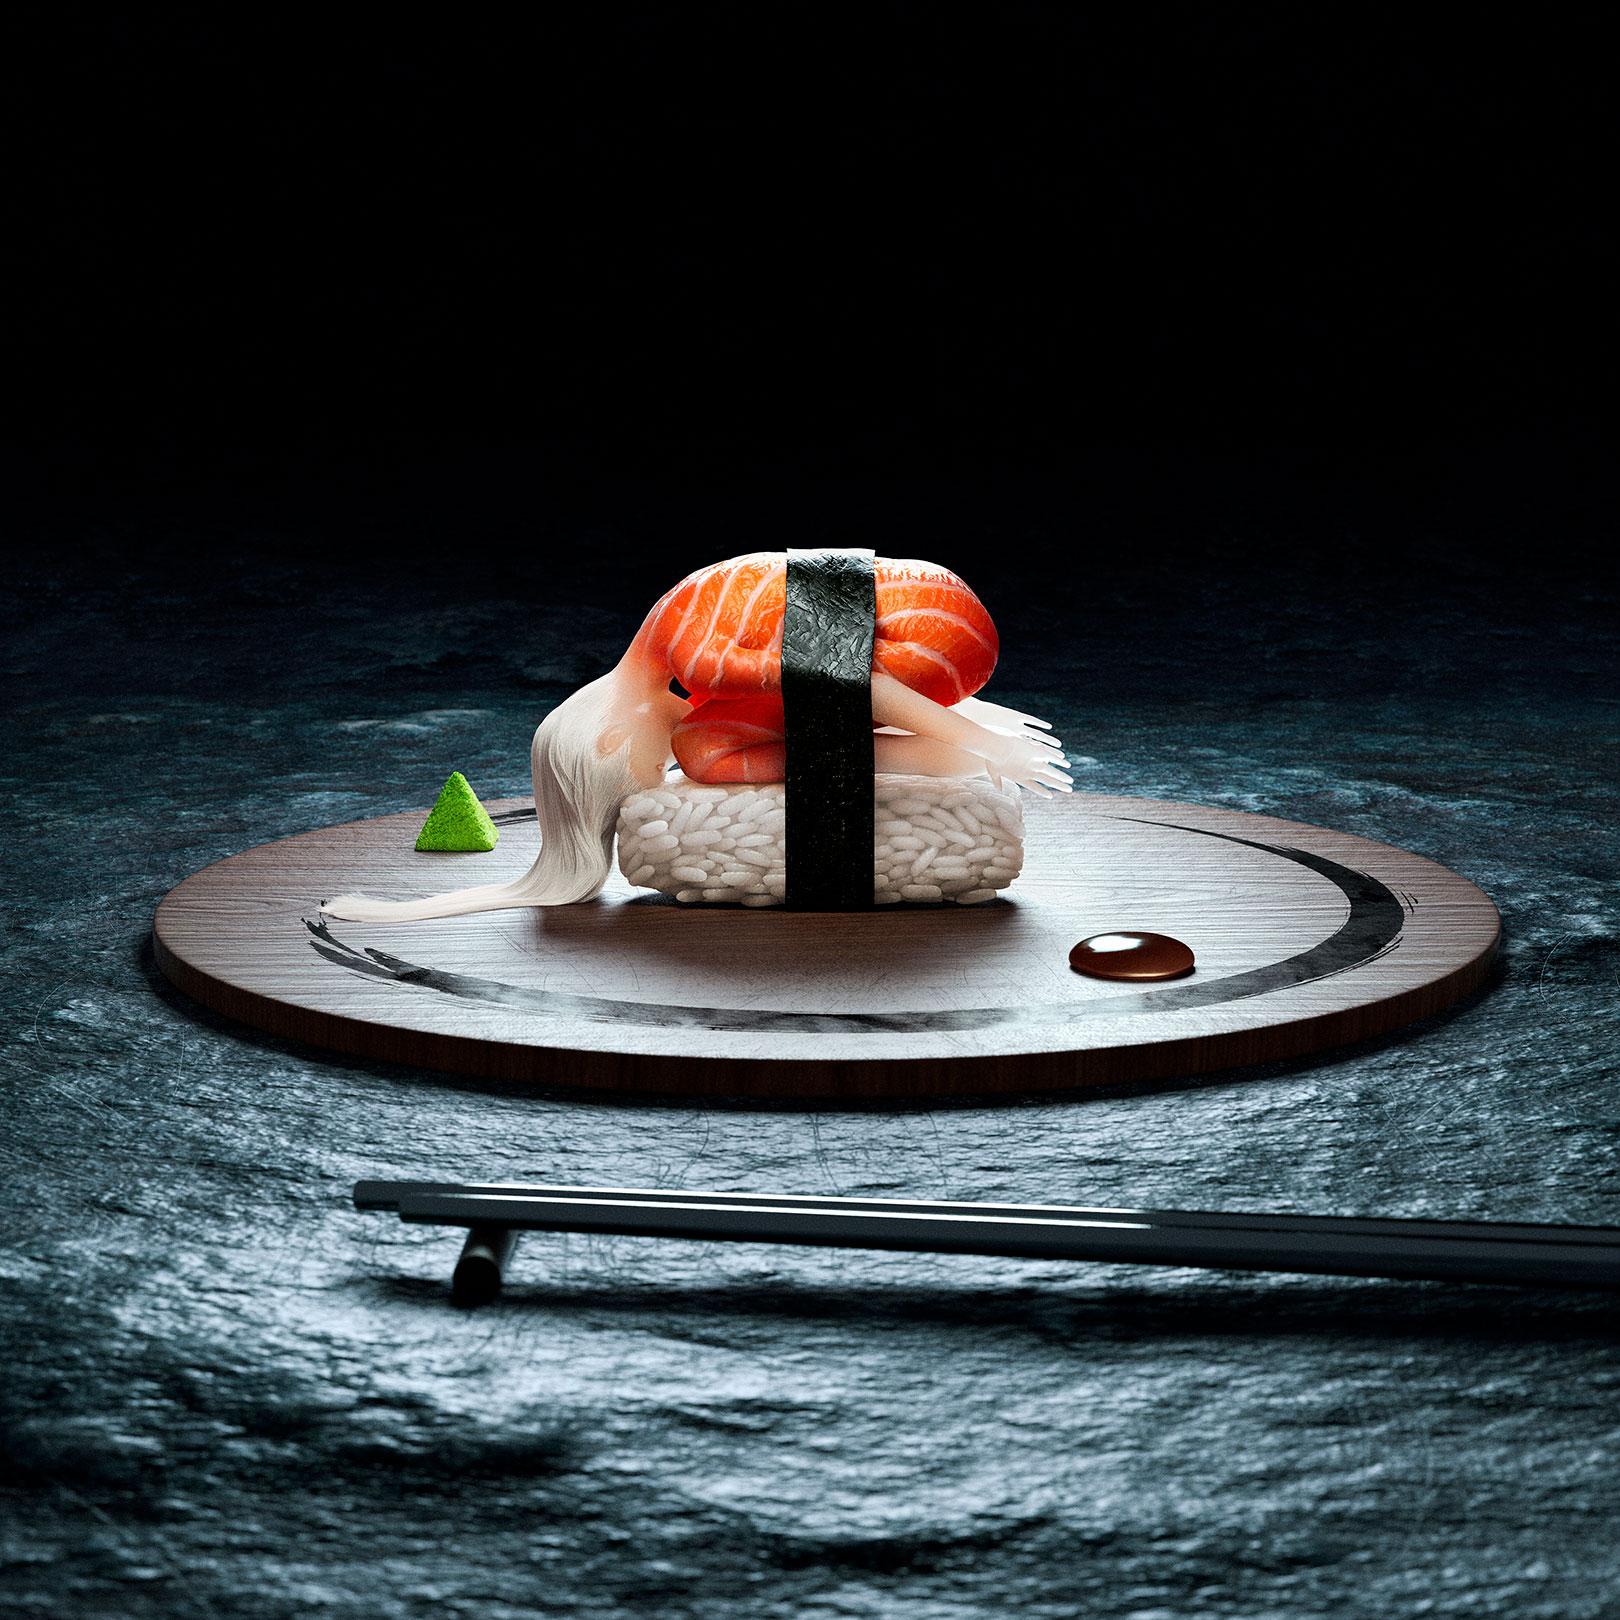 Raw - The ultimate delicacy | Sushi Girl neu interpretiert